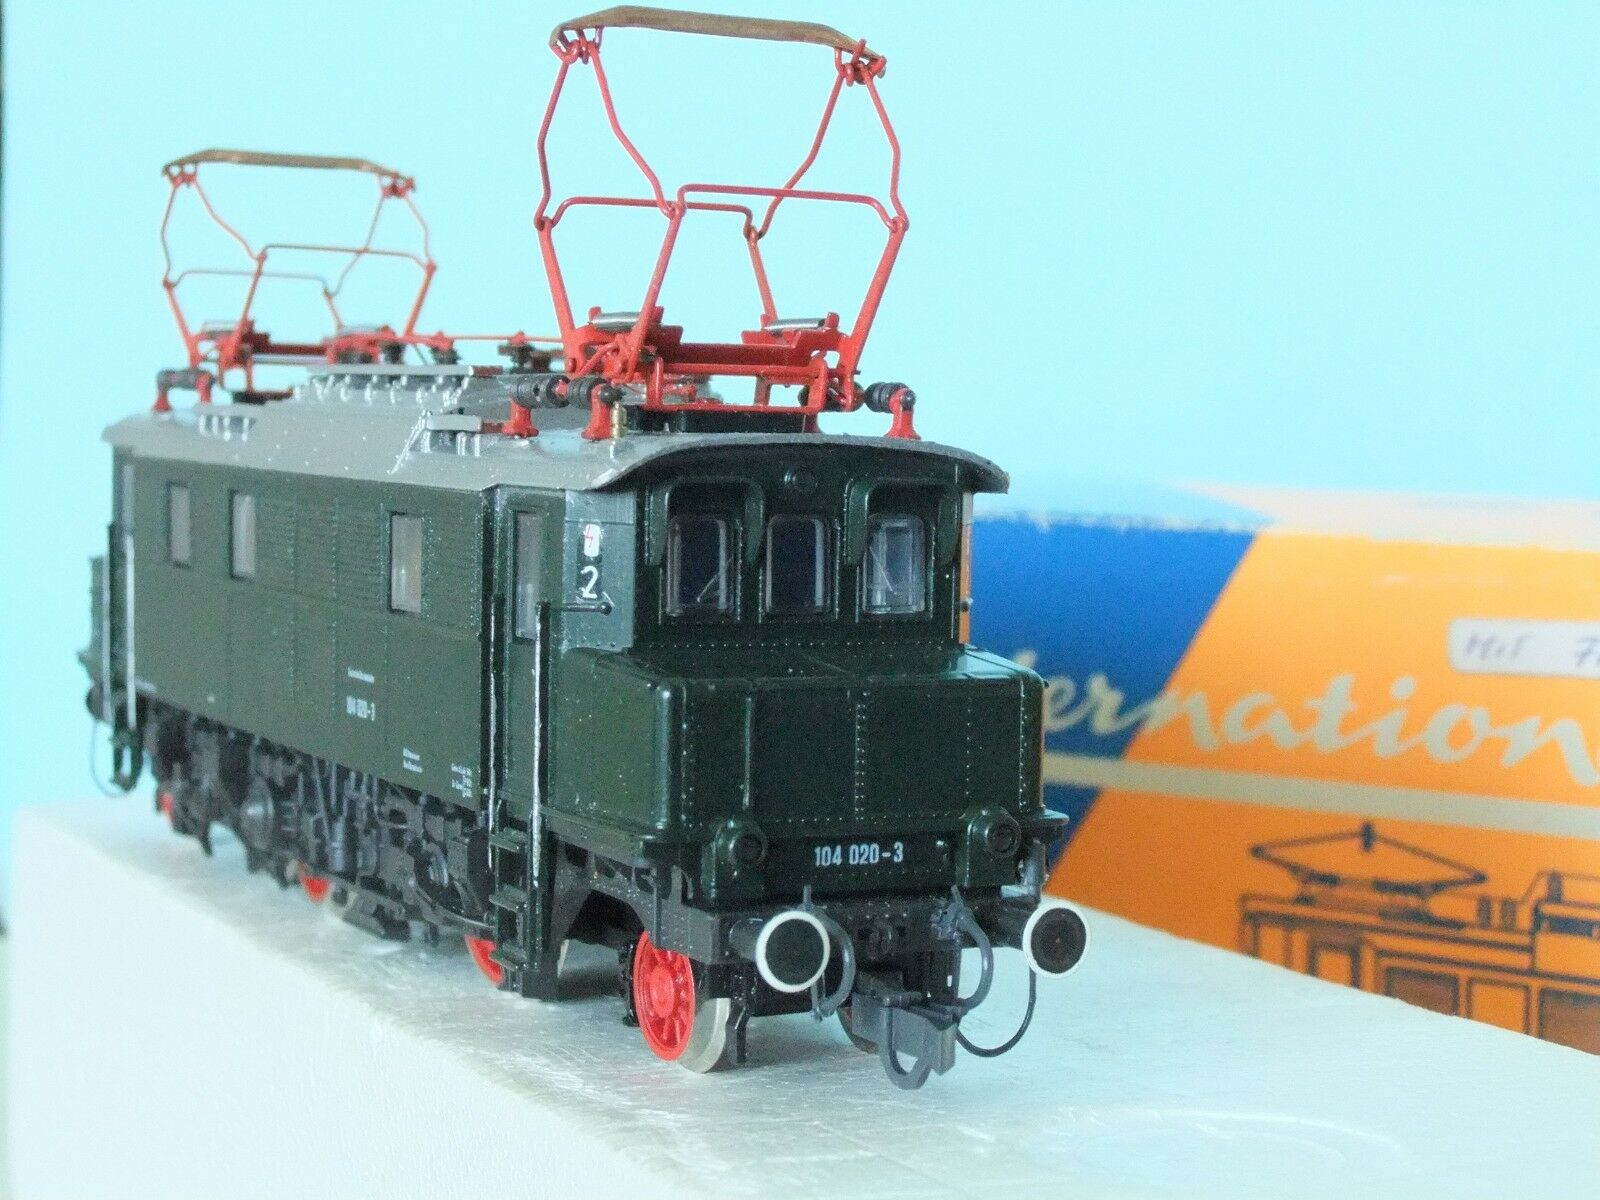 Roco H0 Altbau-Elektrolokomotive E 04, hier 104 104 104 020-3 Ep. IV  Faulhaber Motor  | München Online Shop  b3438a